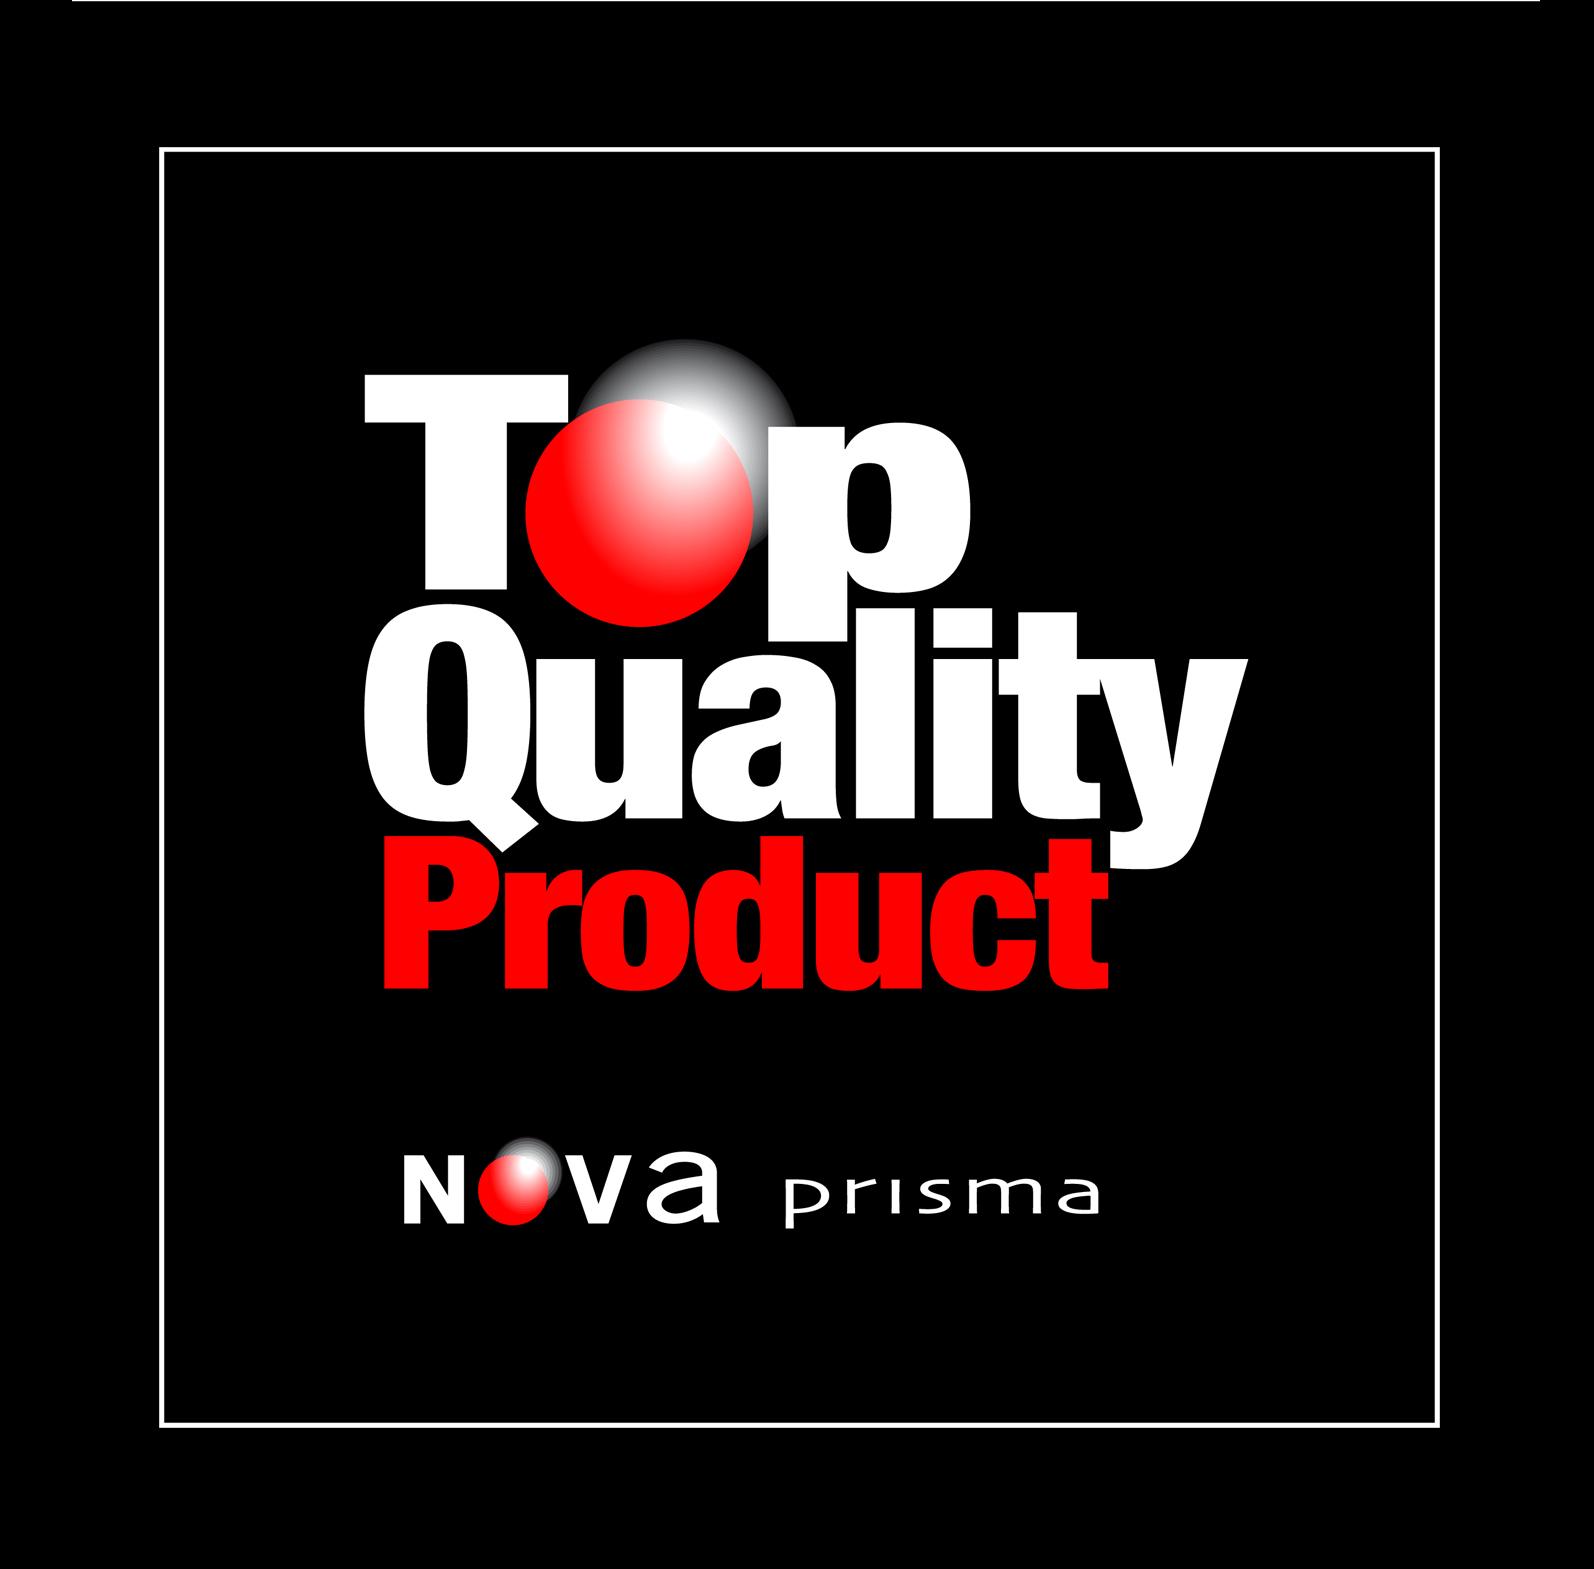 Top Quality Product Nova Prisma